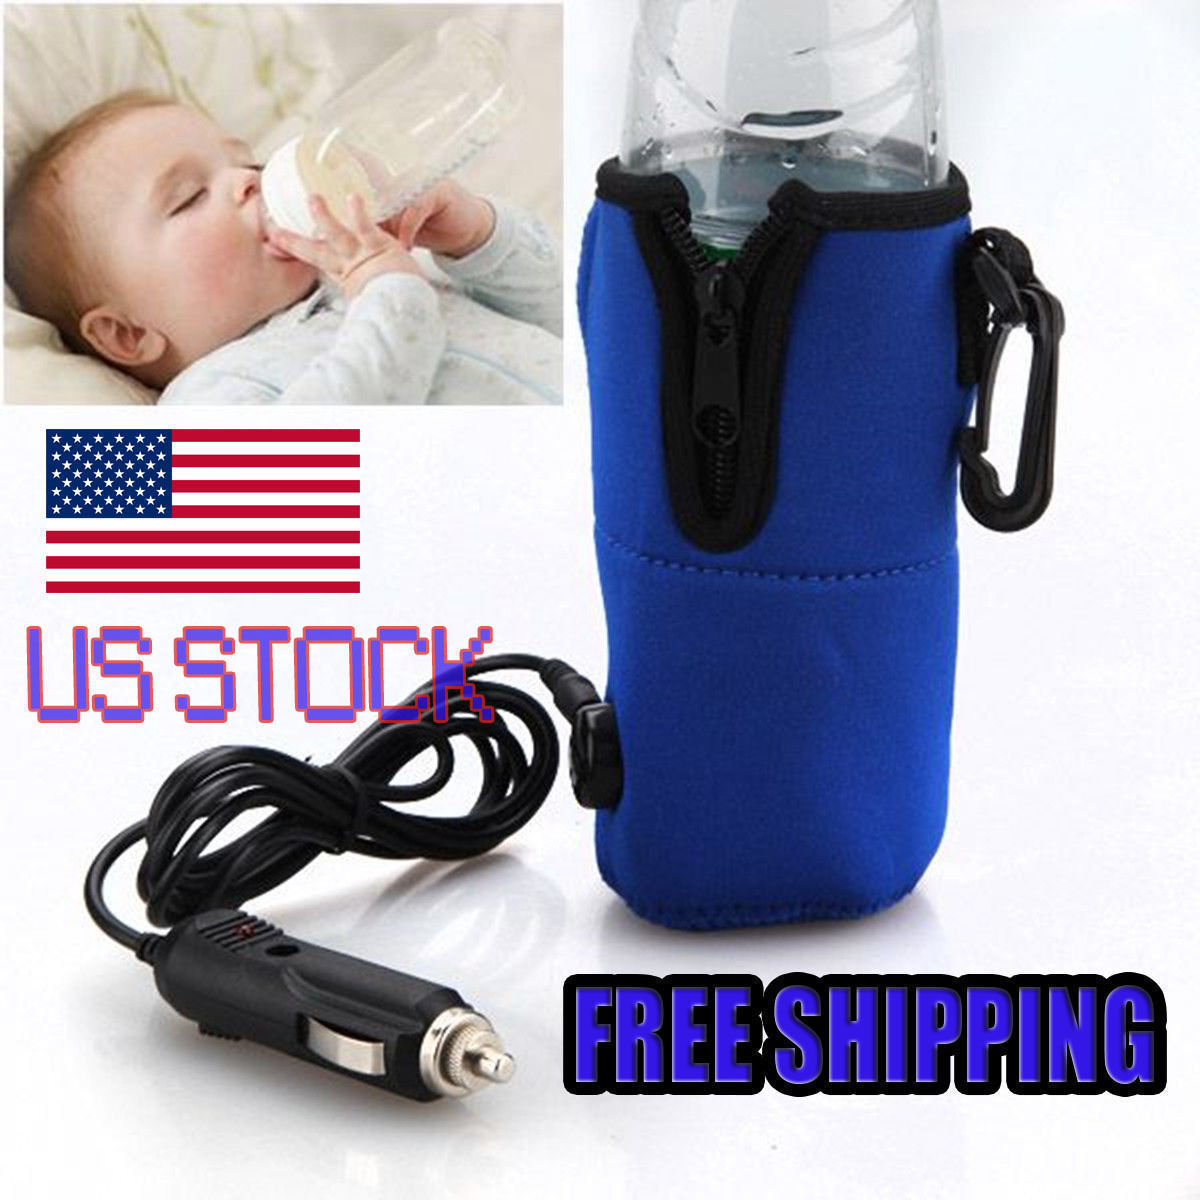 12V Food Milk Water Drink Bottle Cup Warmer Heater Car Auto Travel